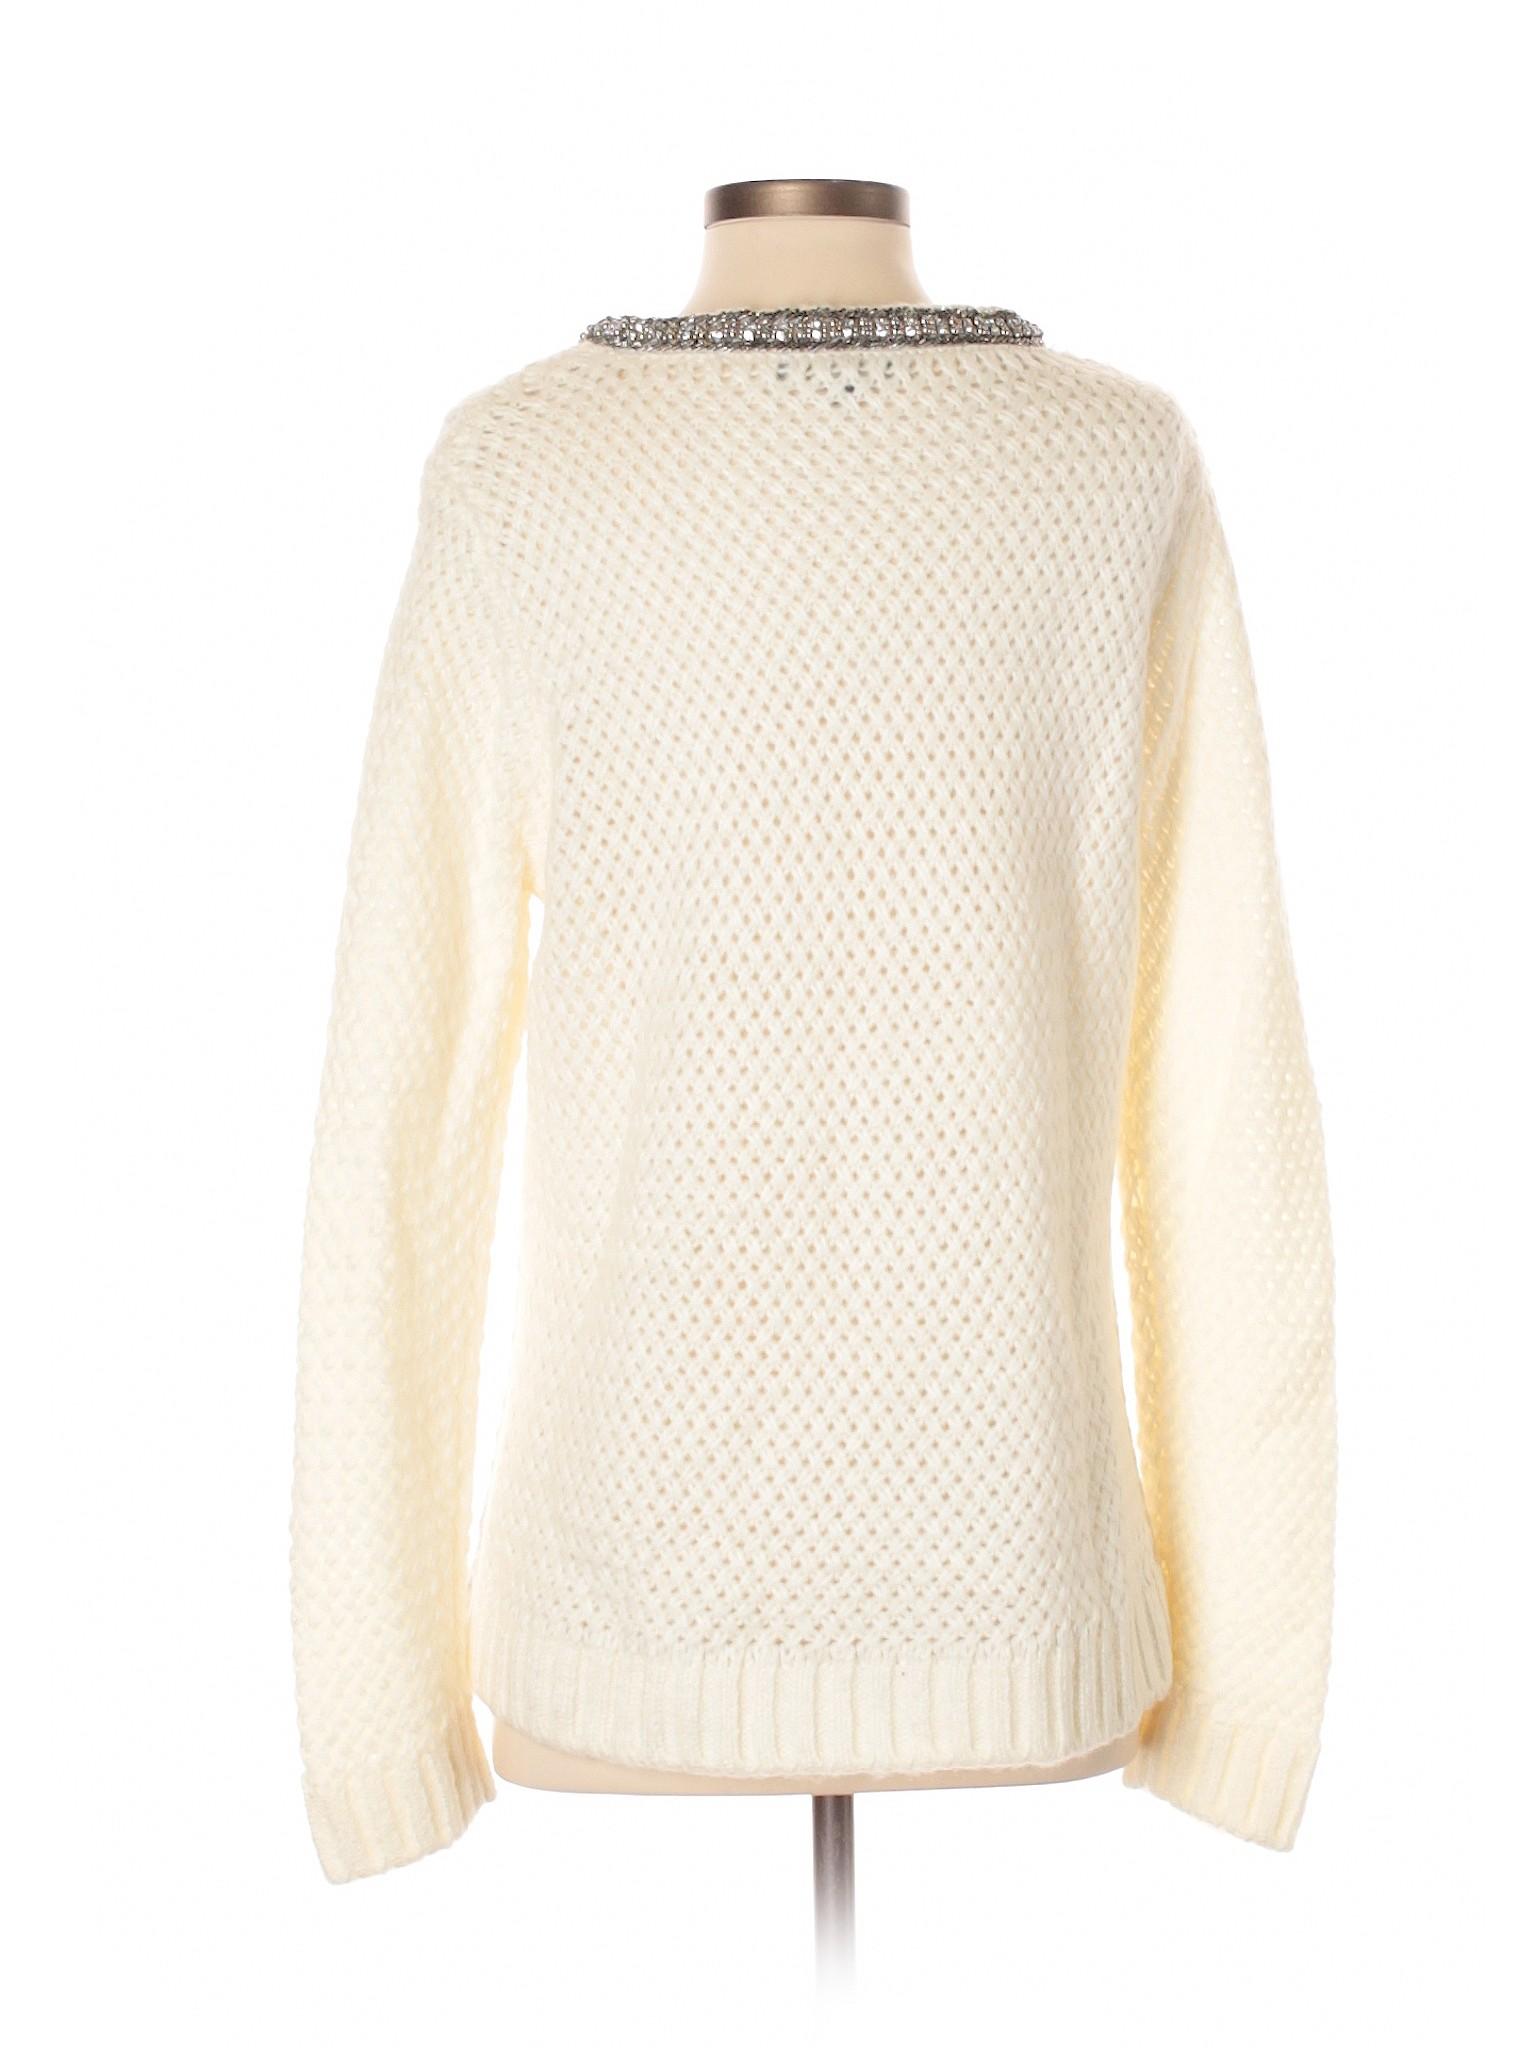 Boutique M Sweater Boutique Matty Matty M Pullover fqpzE7Iw